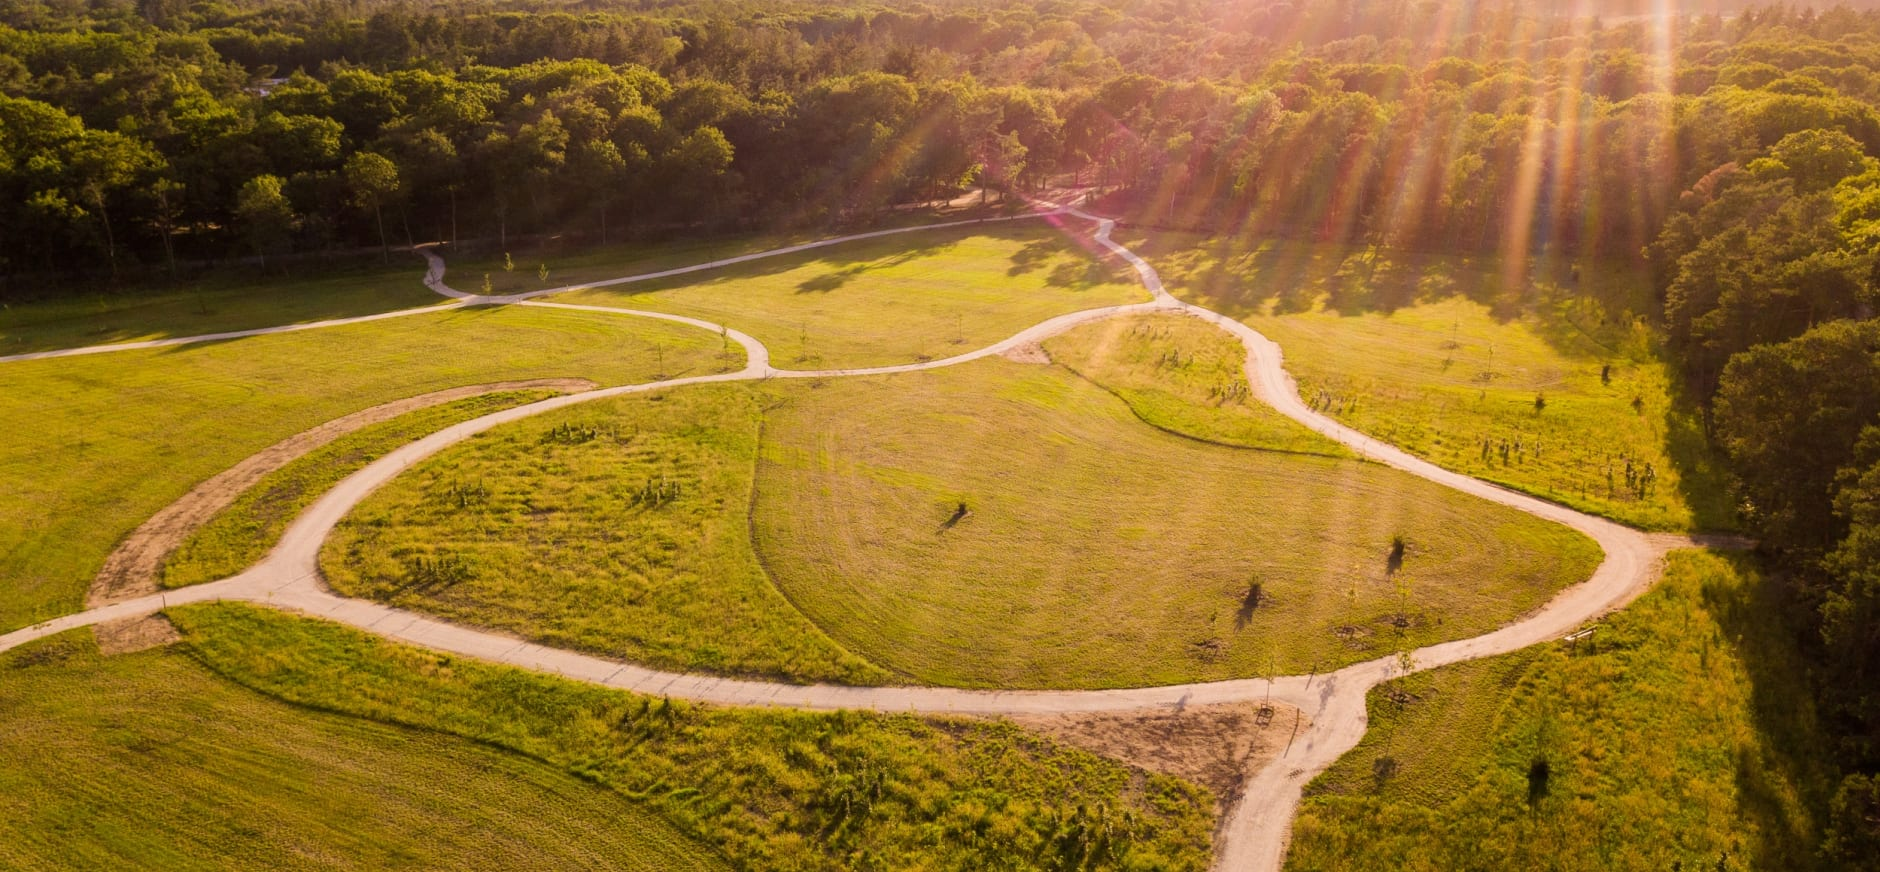 Natuurbegraafplaats Heidepol bij Arnhem